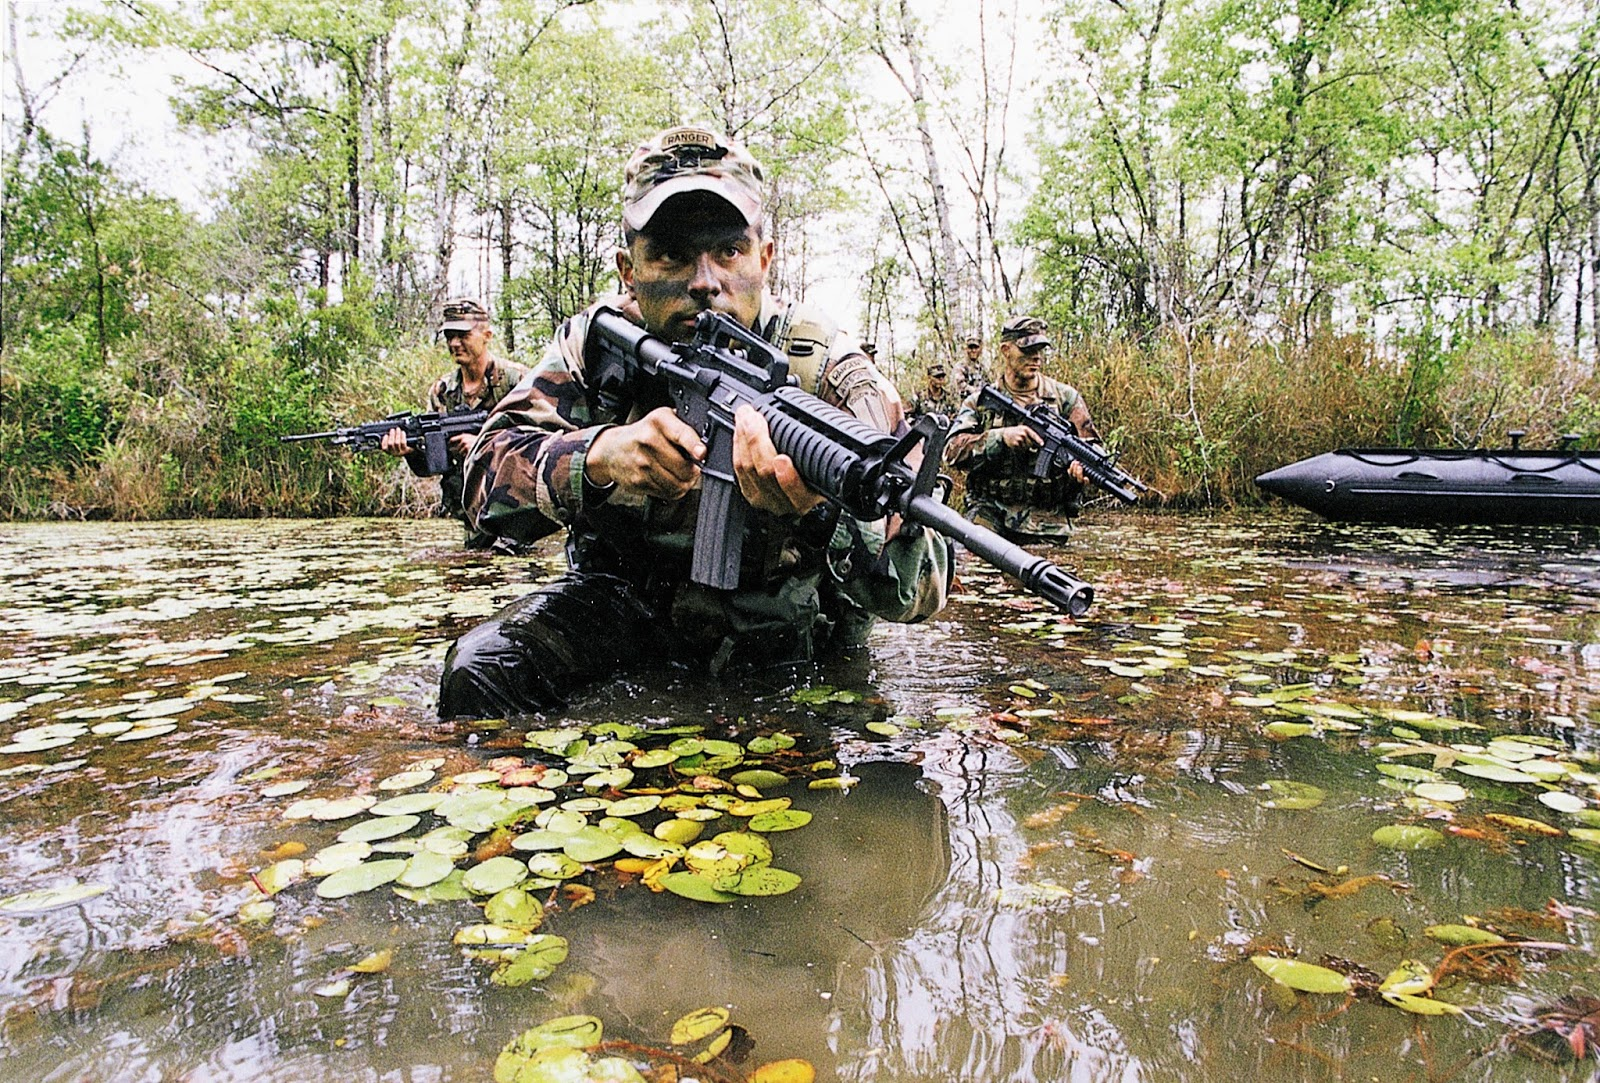 http://1.bp.blogspot.com/-q9AWXvZXtdw/VHmzQ6CGYHI/AAAAAAAADbs/RQF5r3hTjrk/s1600/Army-Rangers-Swamp-HD-Wallpaper-5737.jpg